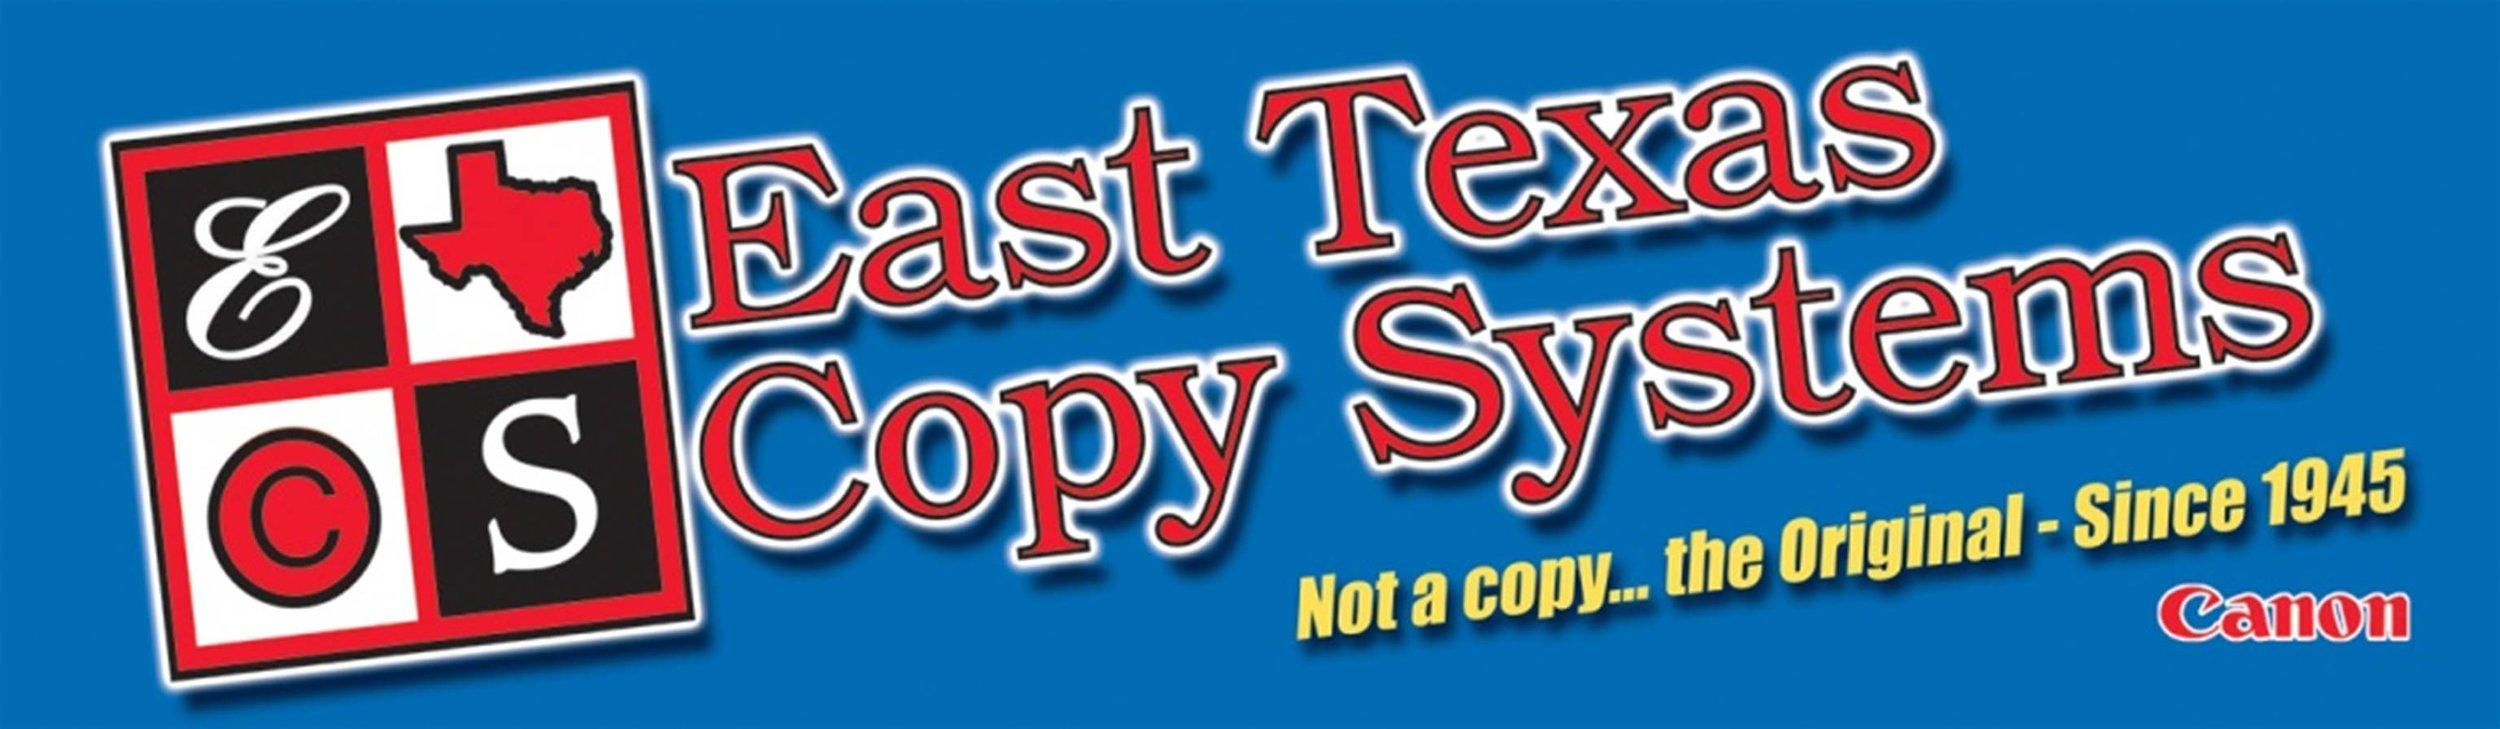 EastTexasCopySystems.Billboard.jpg